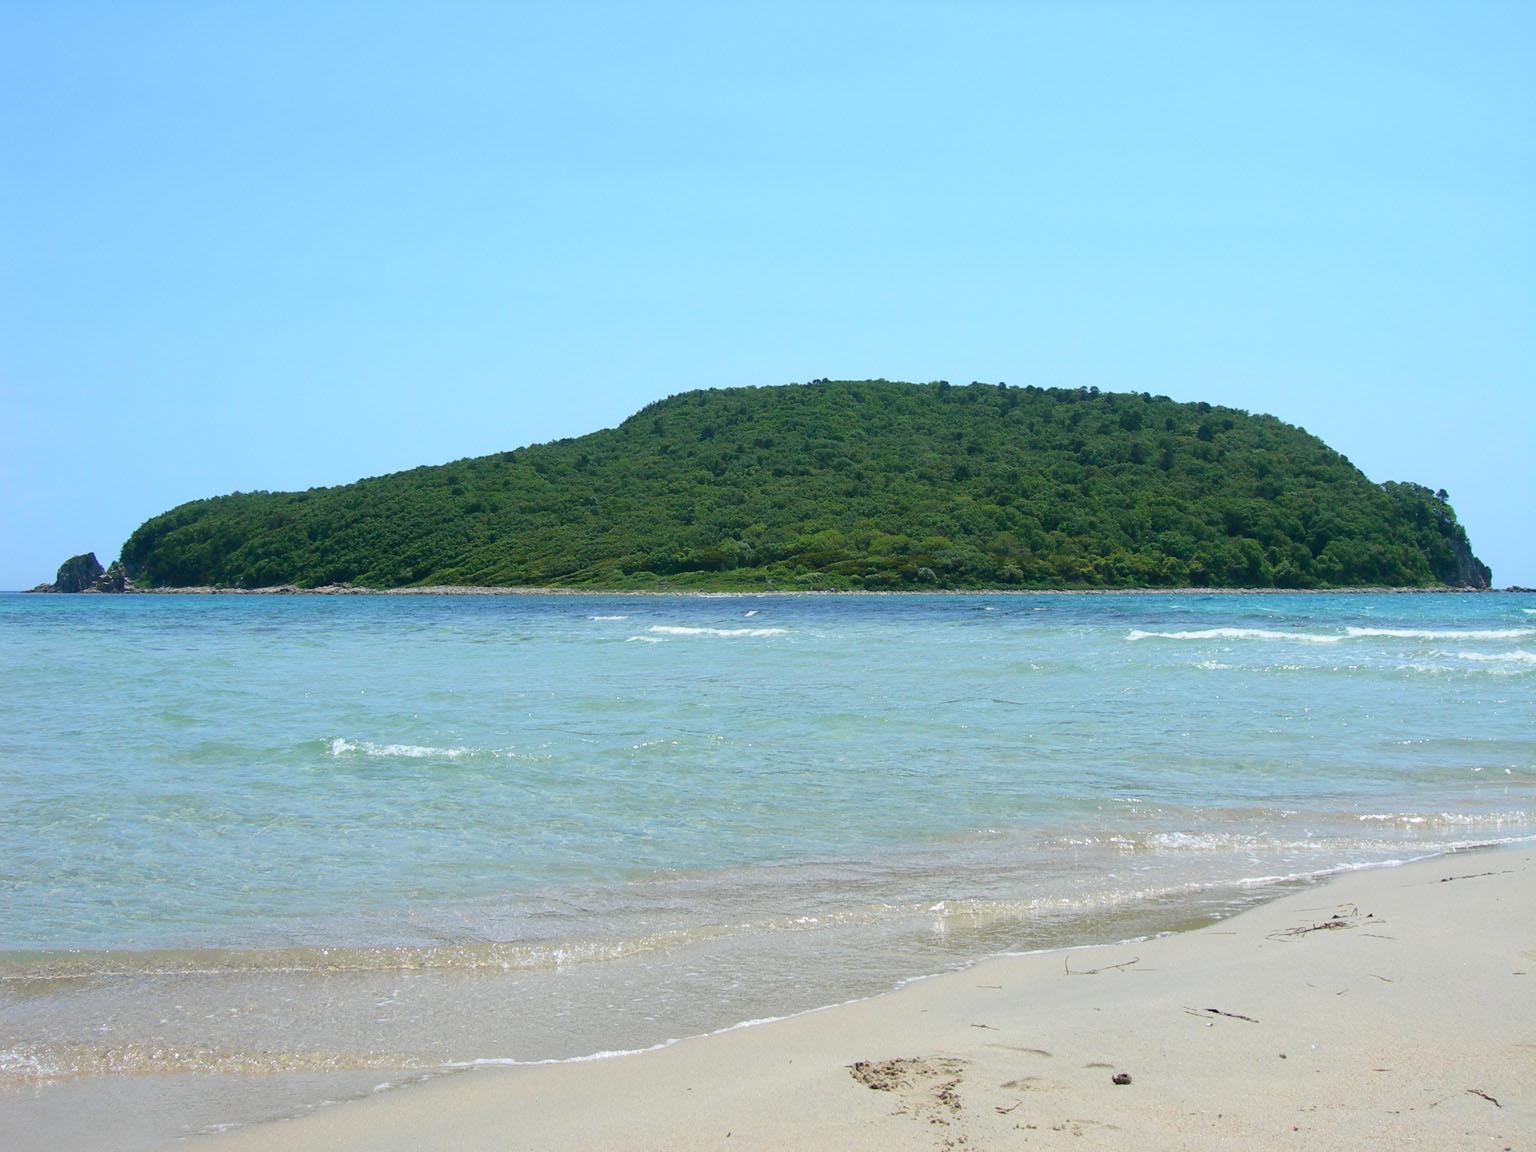 Остров-легенда